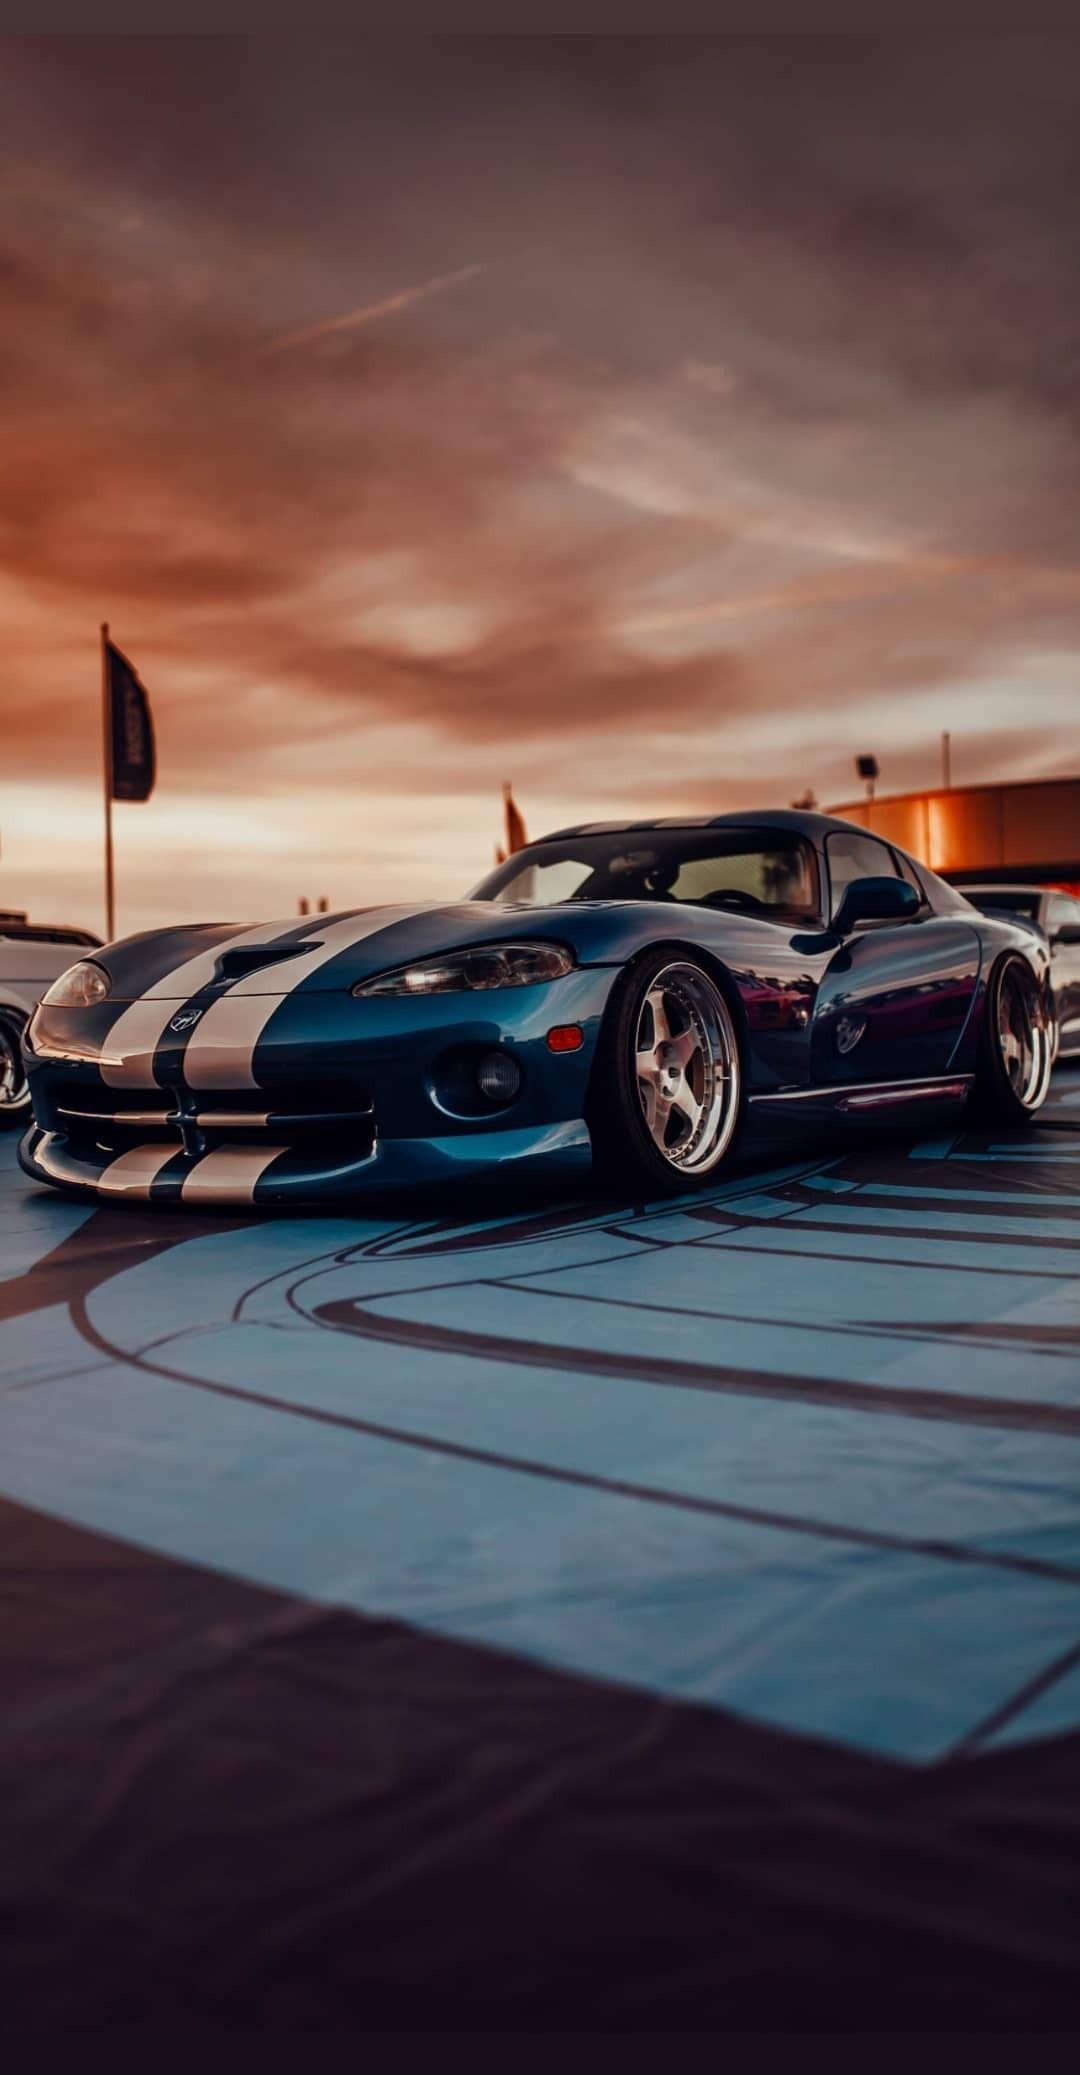 Car Wallpapers Car Ride Dream Cars